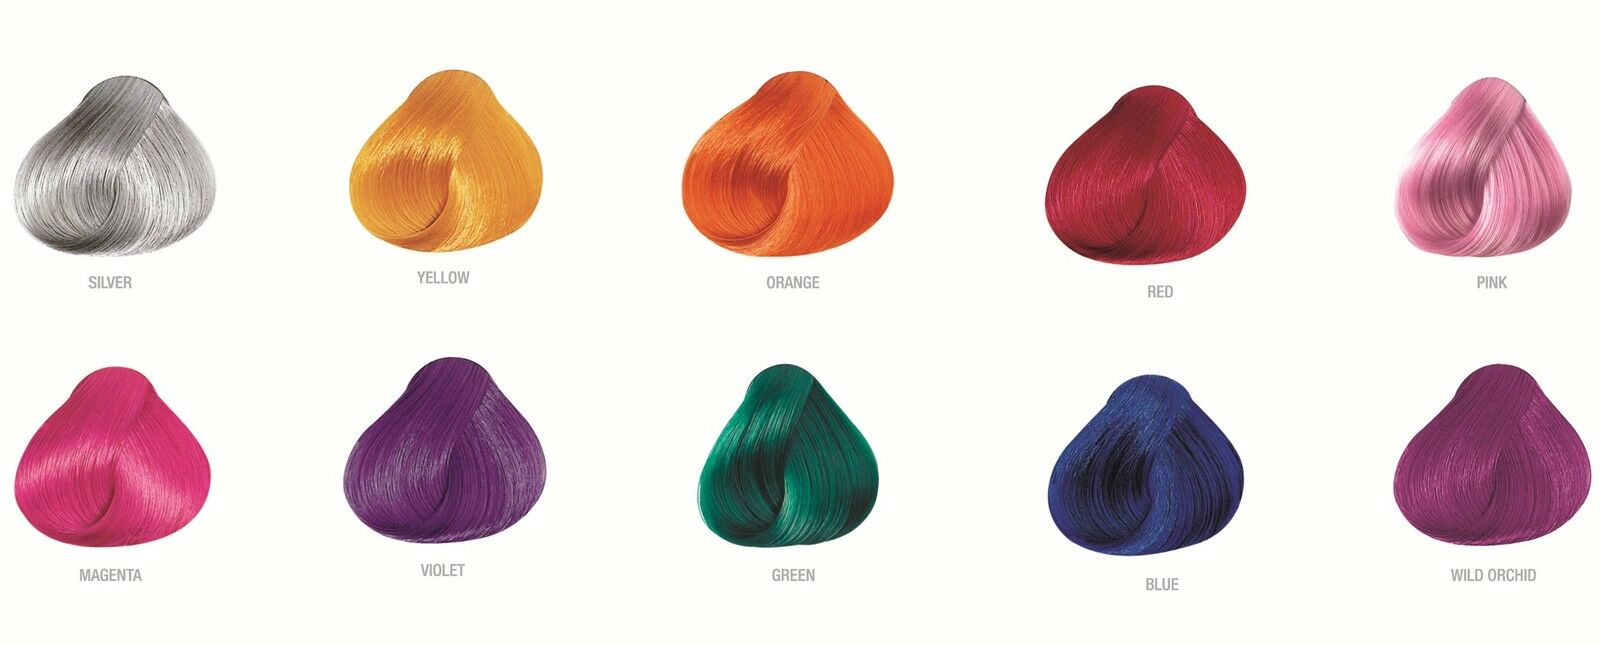 X2 pravana chromasilk vivids permanent hair dye silver smokey blue resntentobalflowflowcomponenttechnicalissues nvjuhfo Images